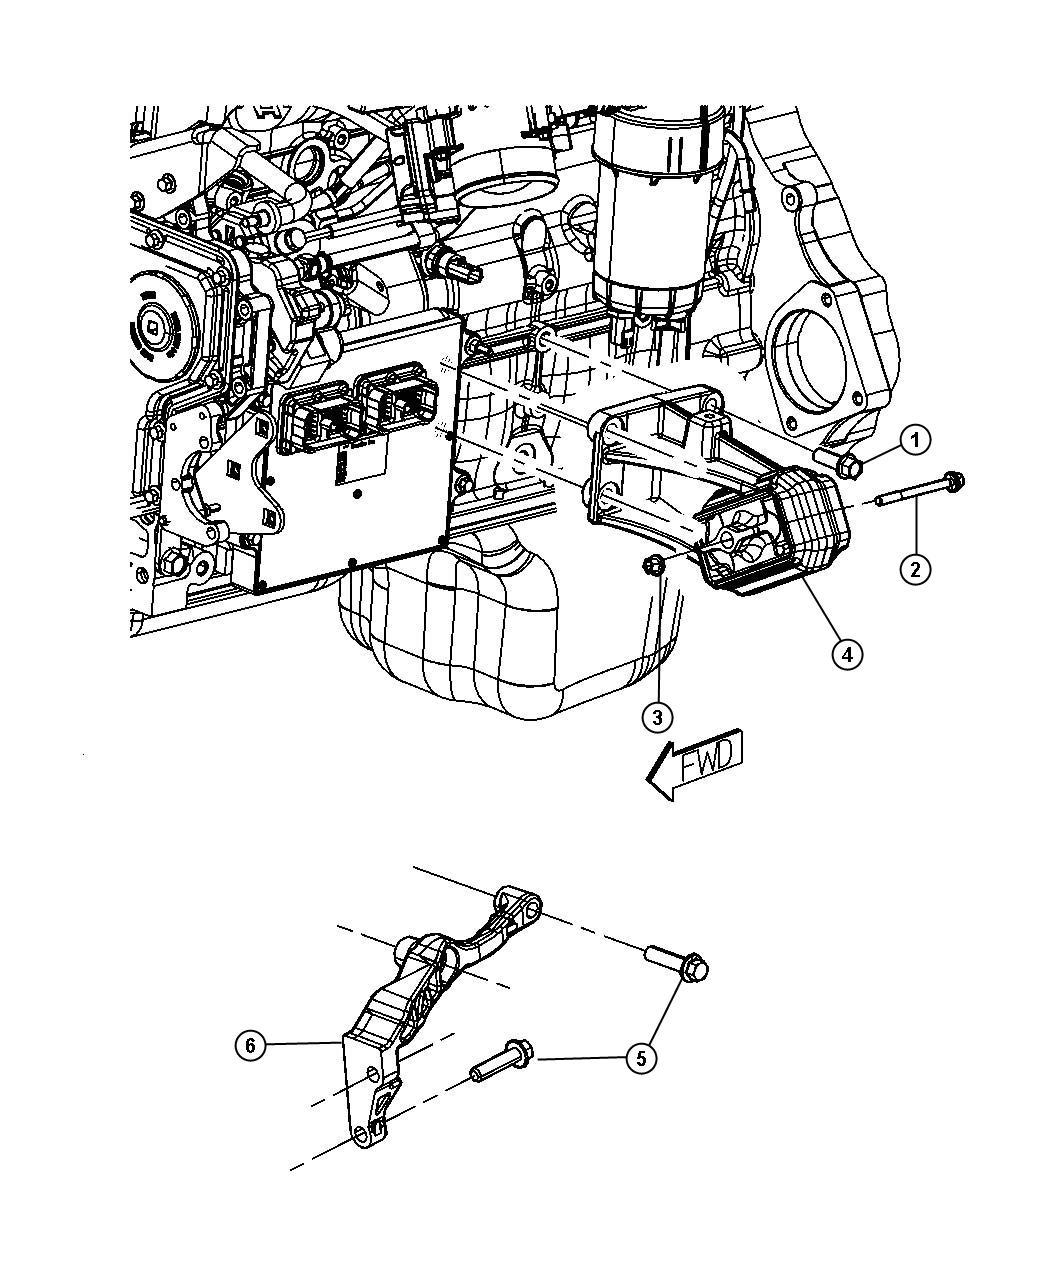 Engine Mounting Left Side Rwd 2wd 6 7l Etj